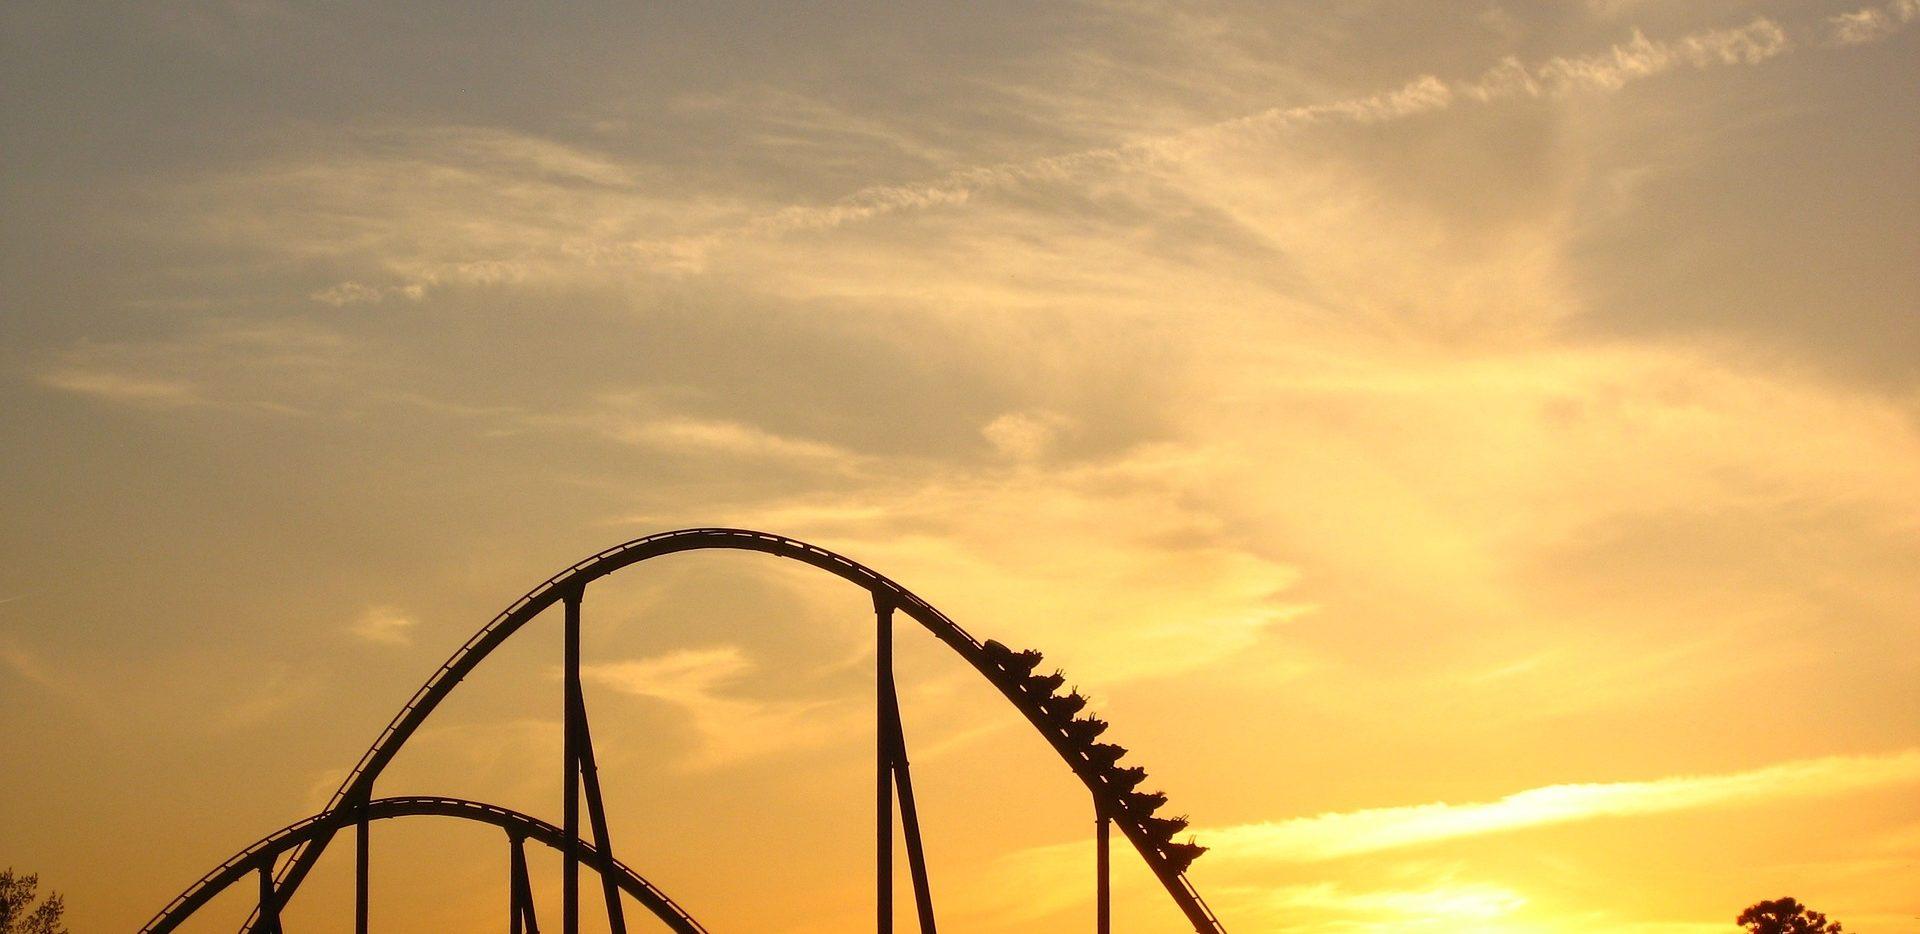 roller-coaster-sunset